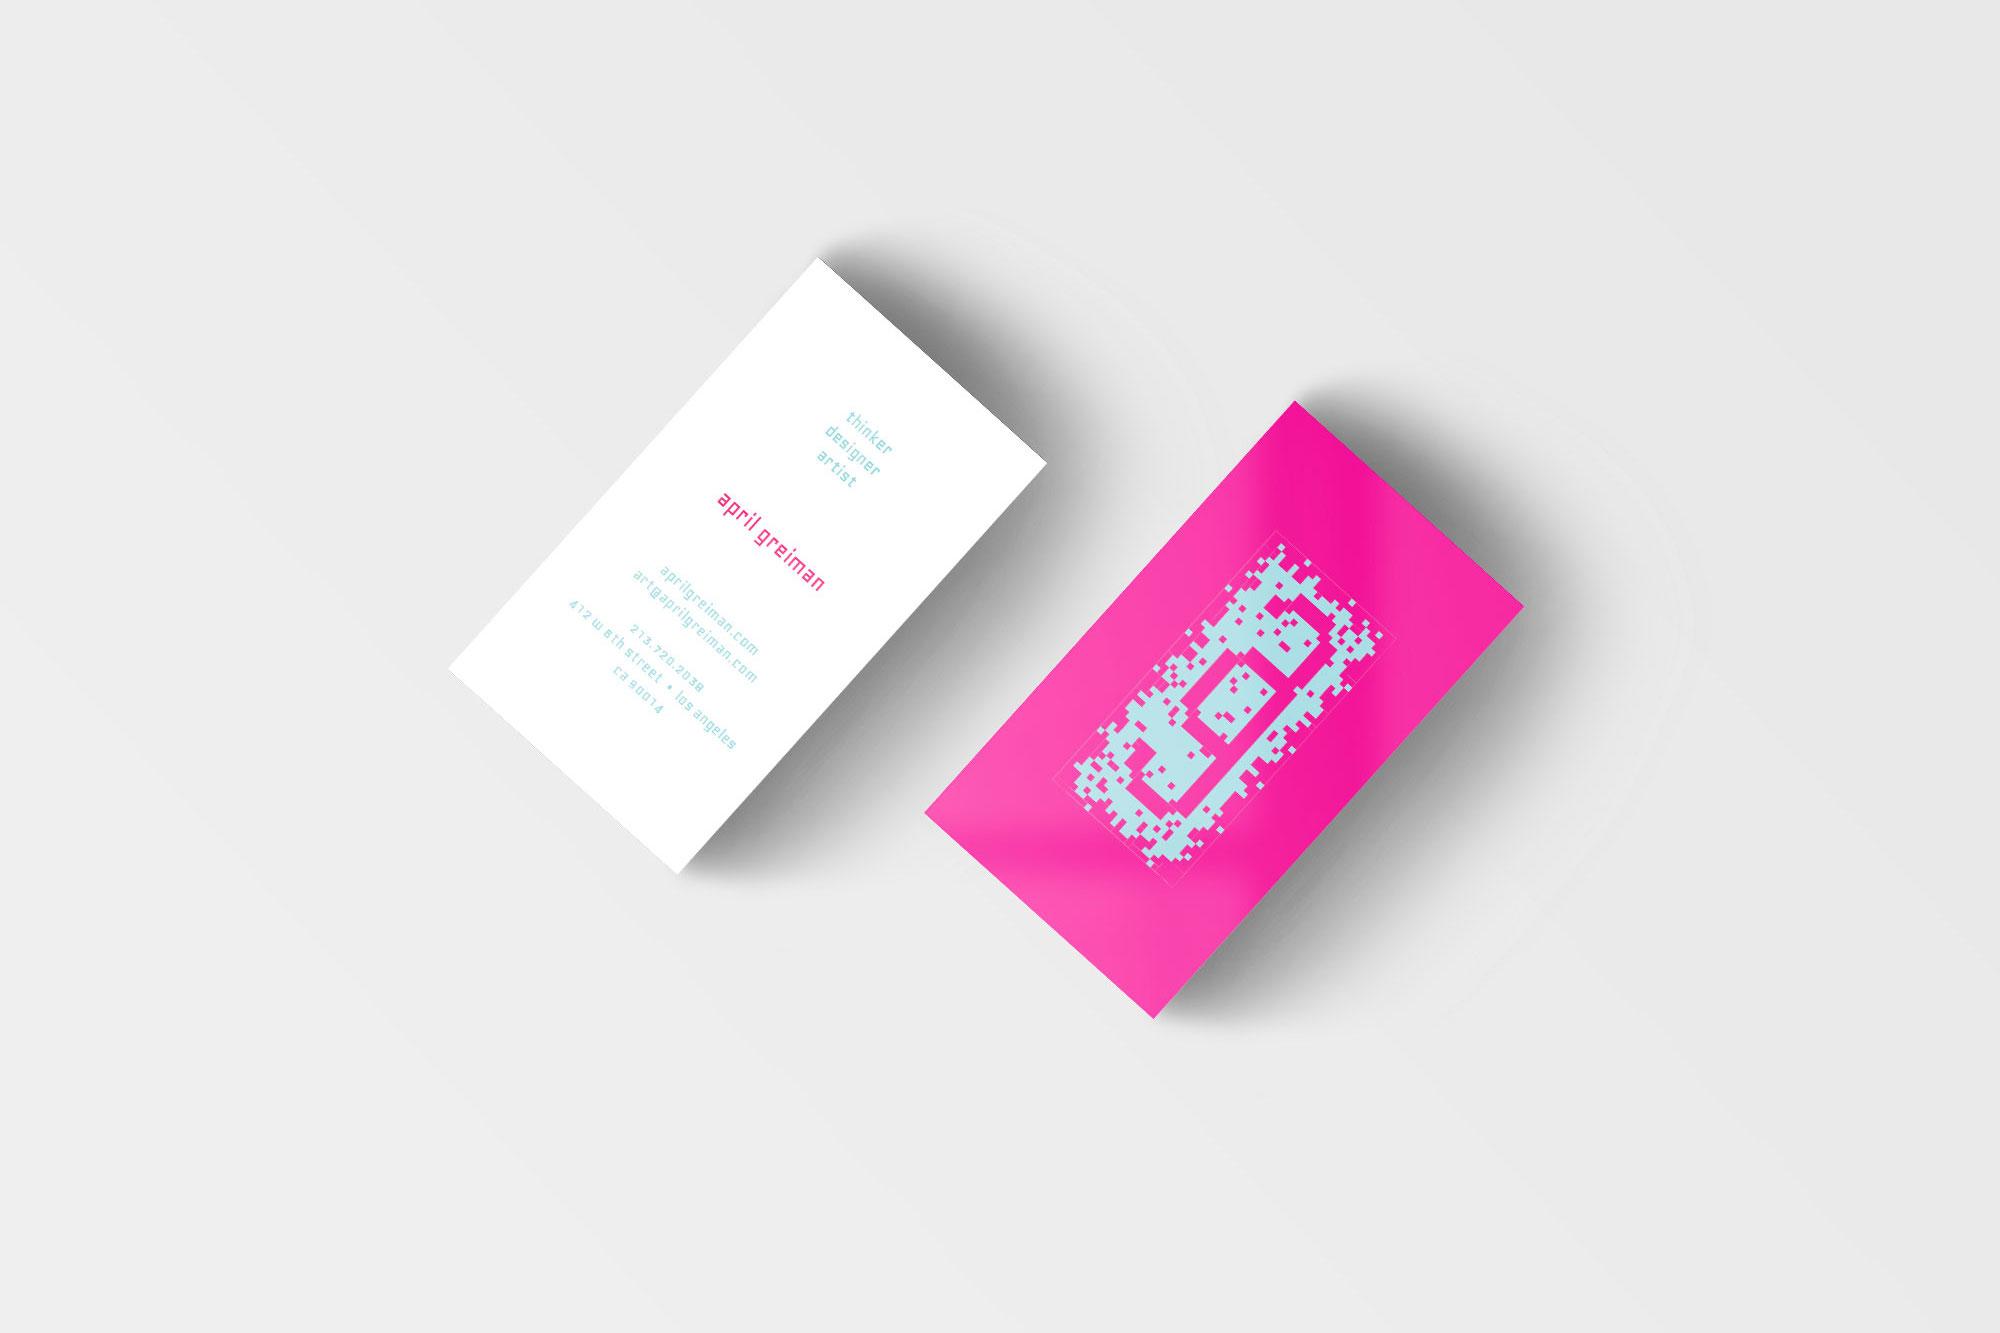 Alex hammarskjold monogram and business card created for april greiman magicingreecefo Images